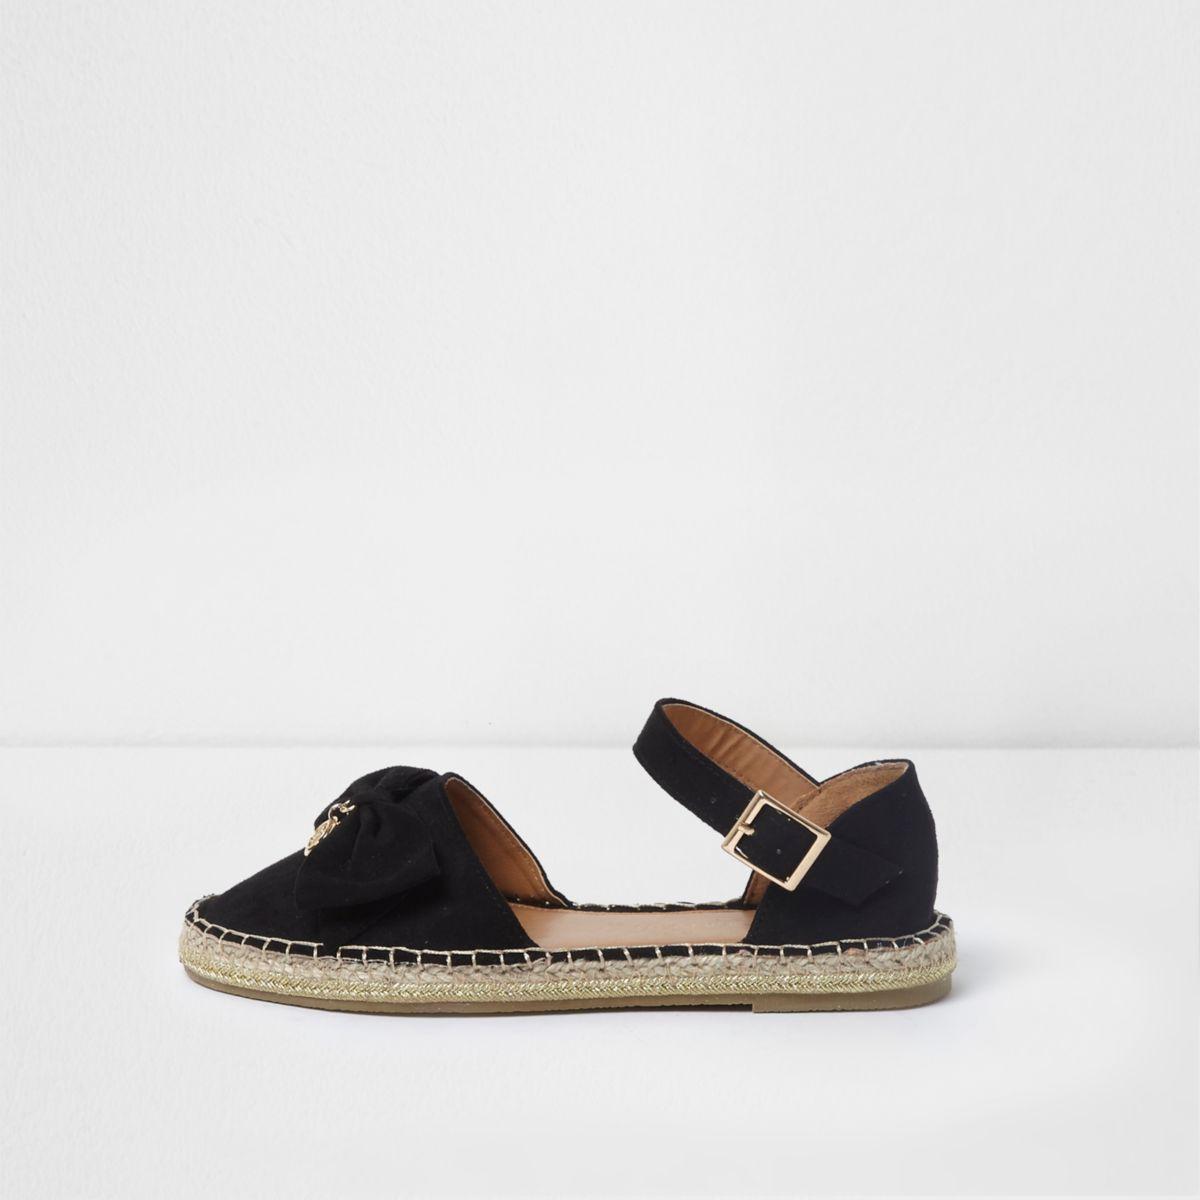 Girls black bow top espadrille sandals